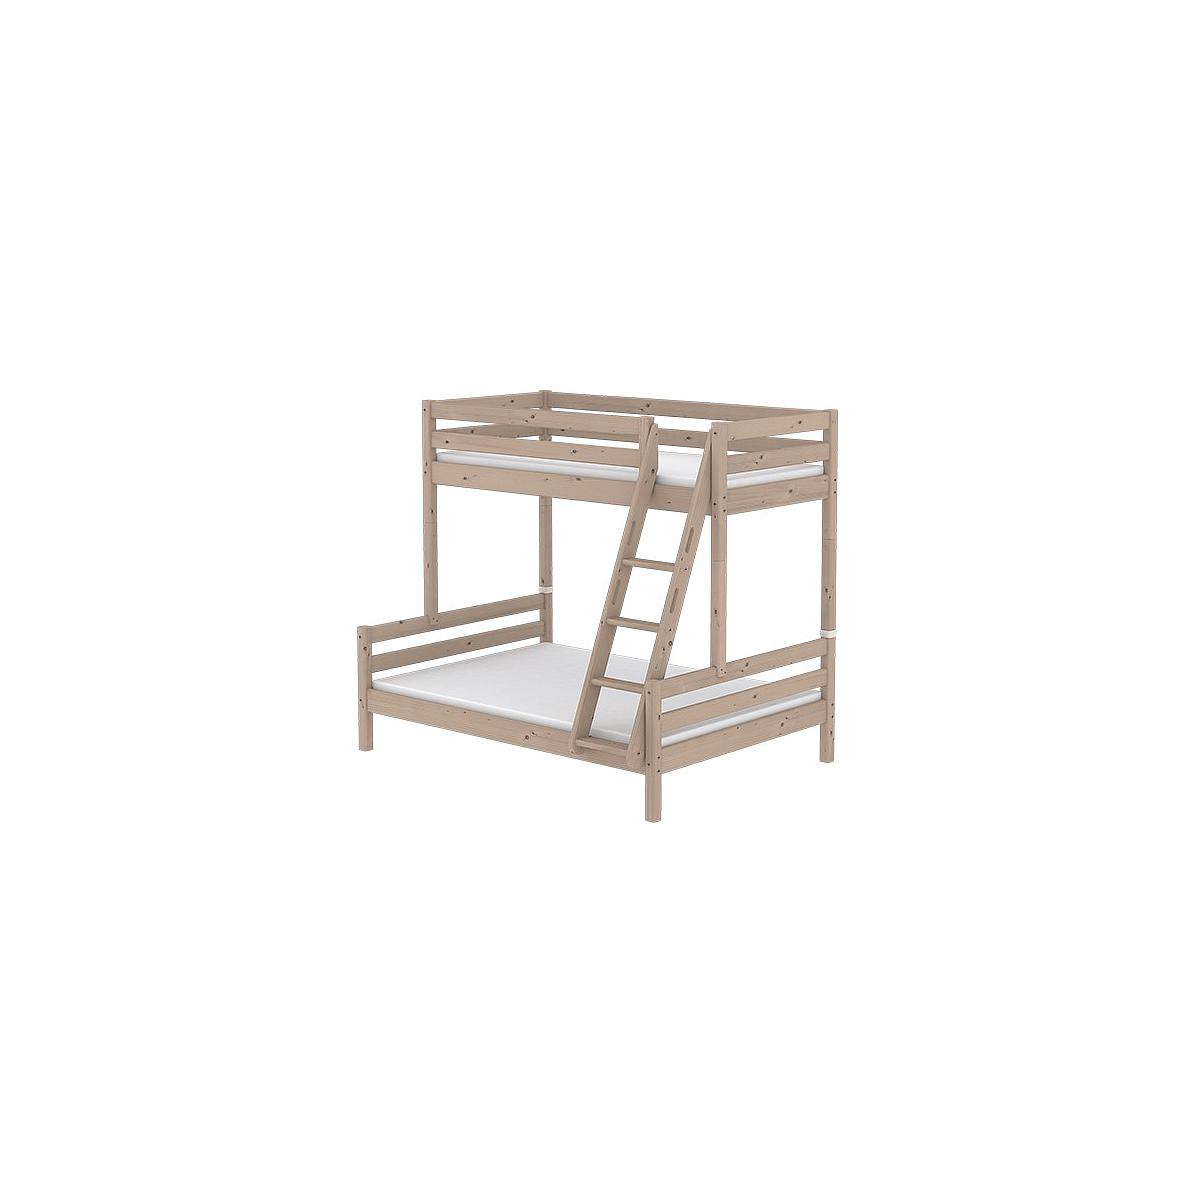 Litera combi 140/90x190 CLASSIC Flexa escalera inclinada terra